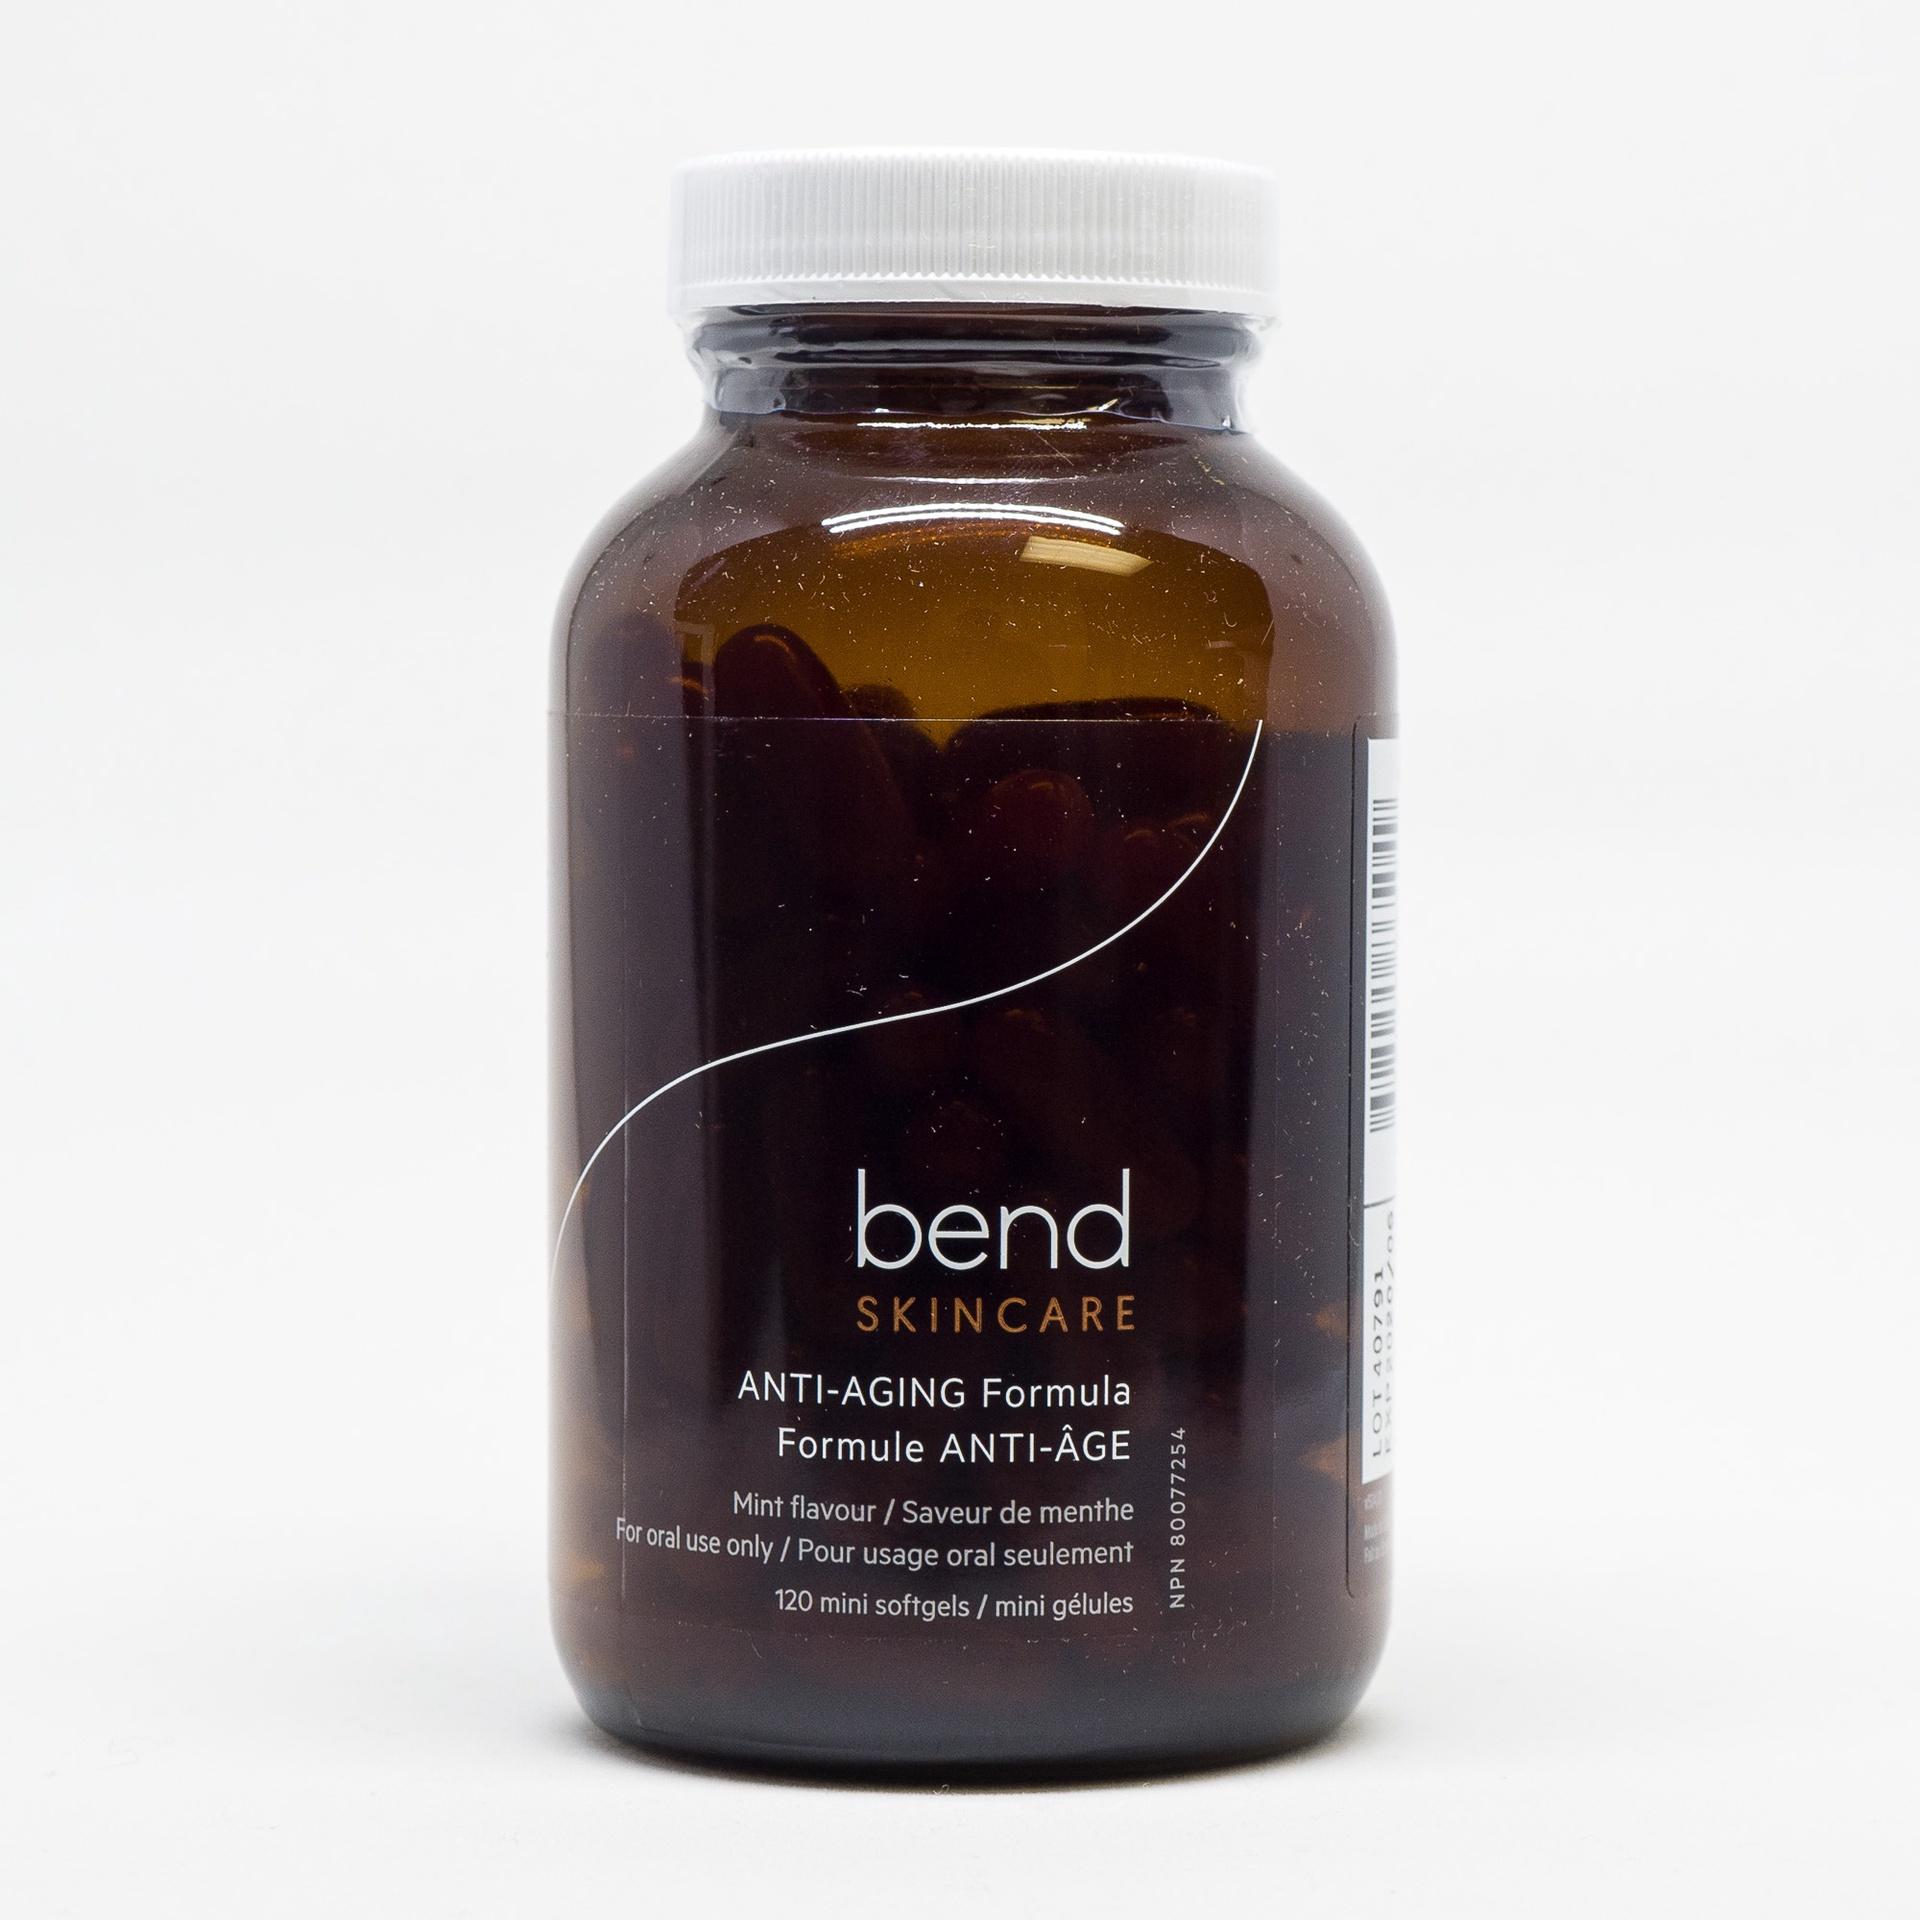 Bend Anti-Aging - Capsules